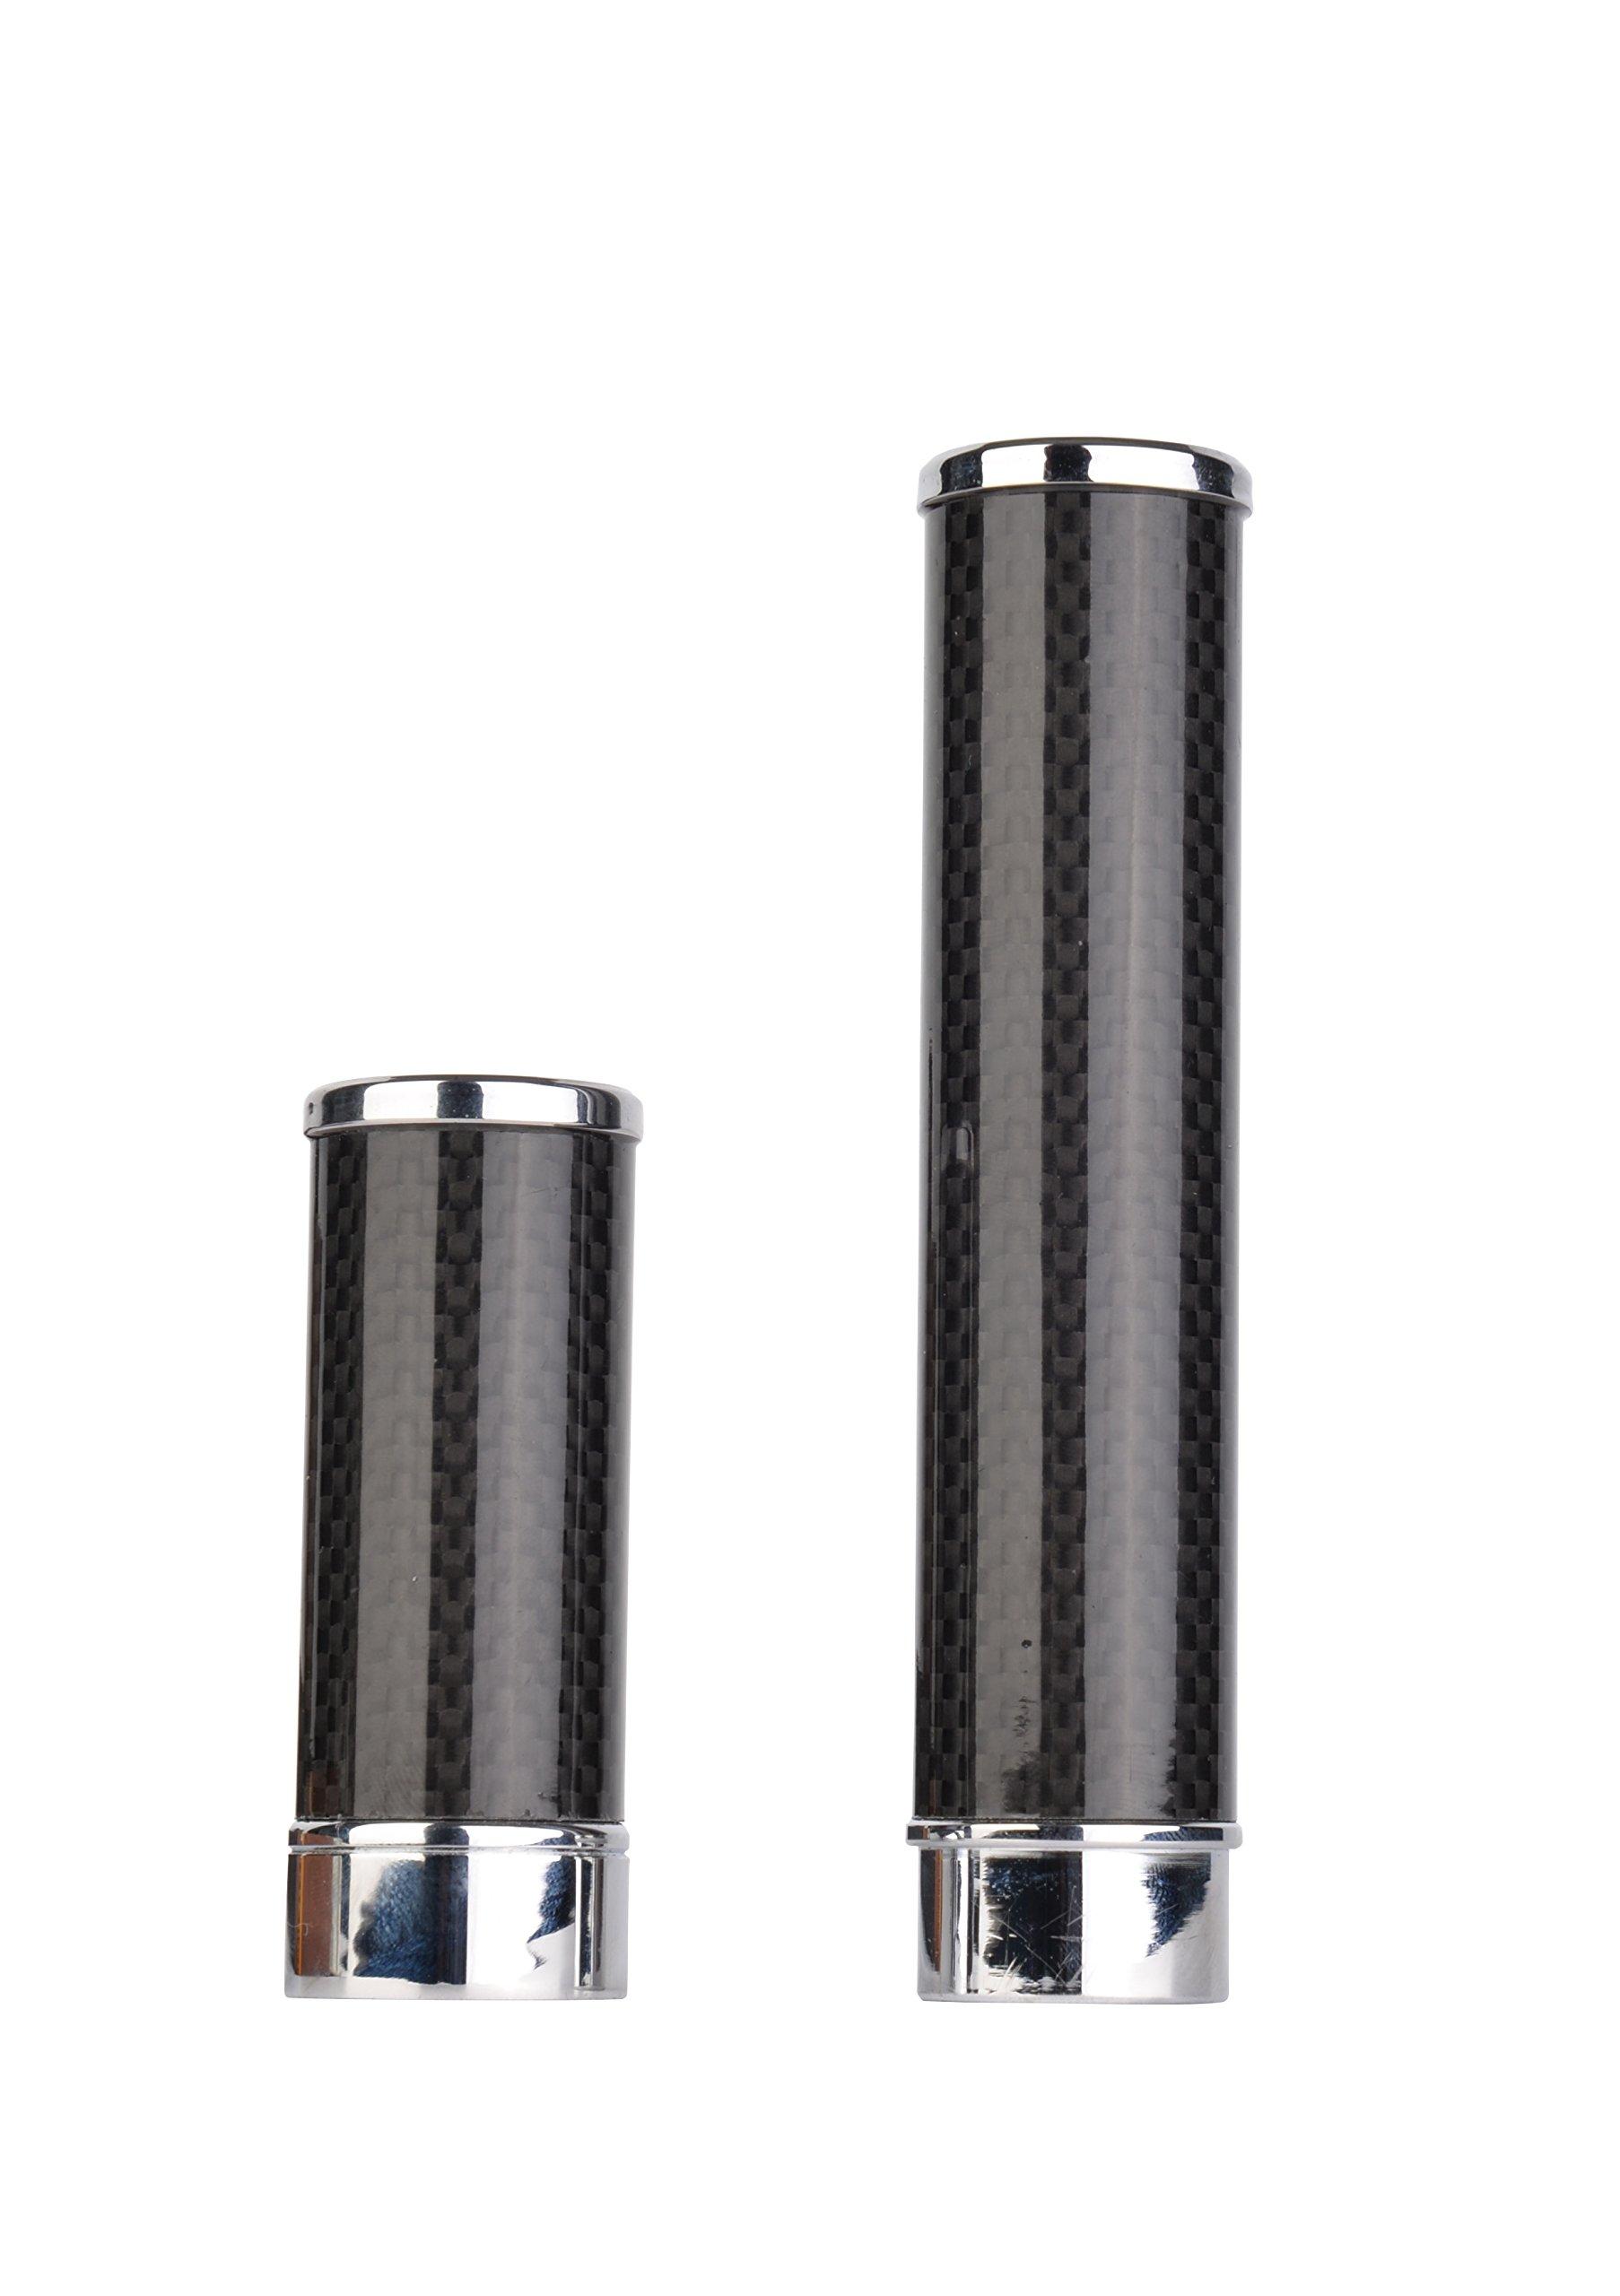 Carbon Fiber Cigar Case Tube Holder CL Carbonlife Travel Case With Humidor Excalibur